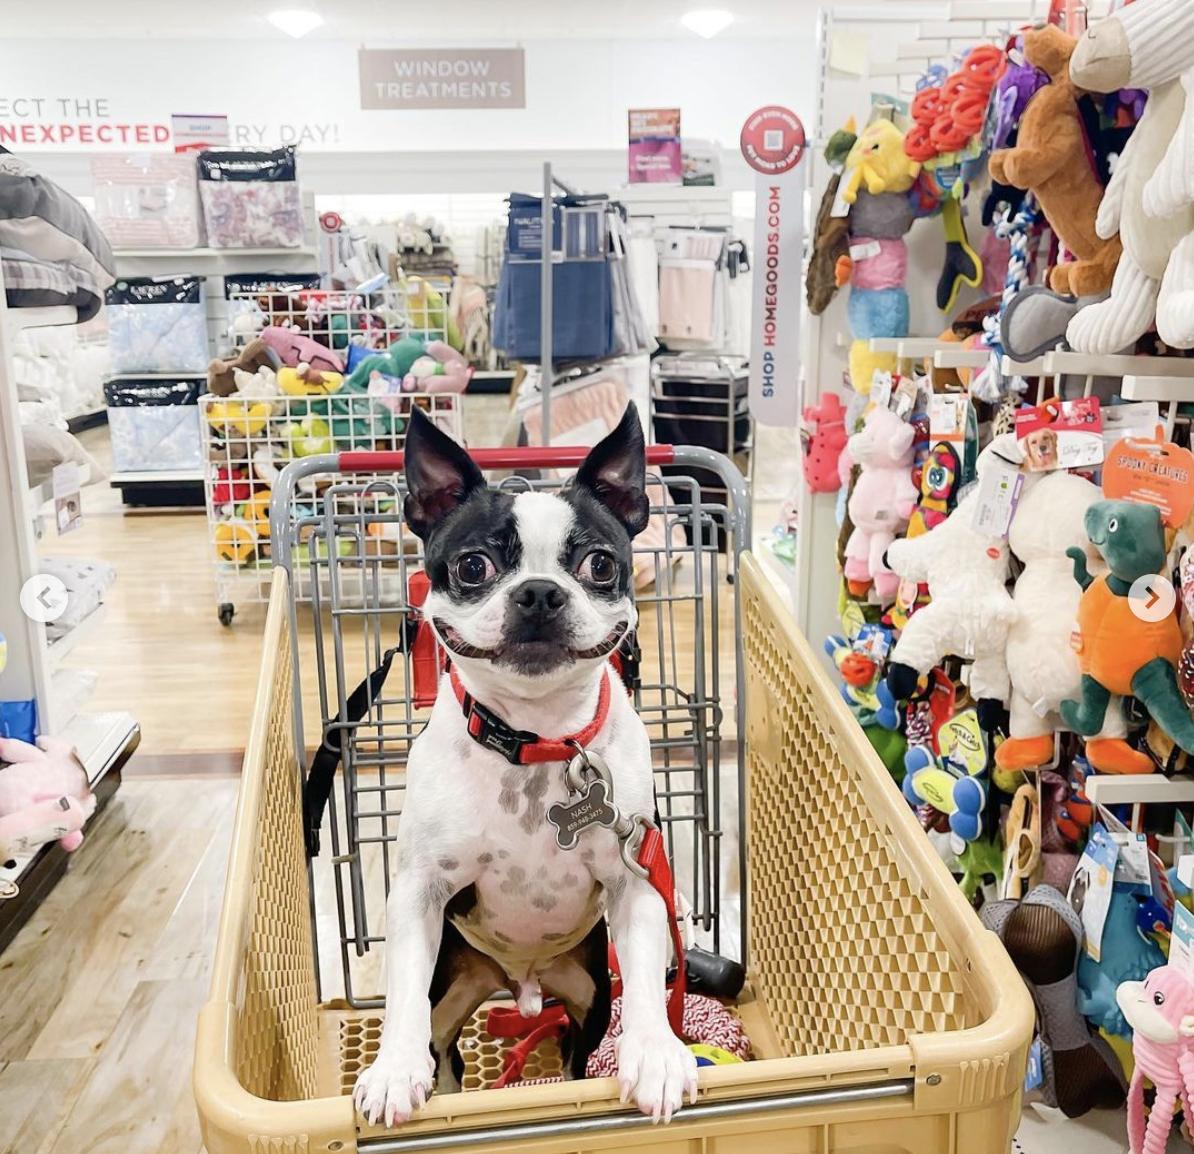 Grinning Boston Terrier!